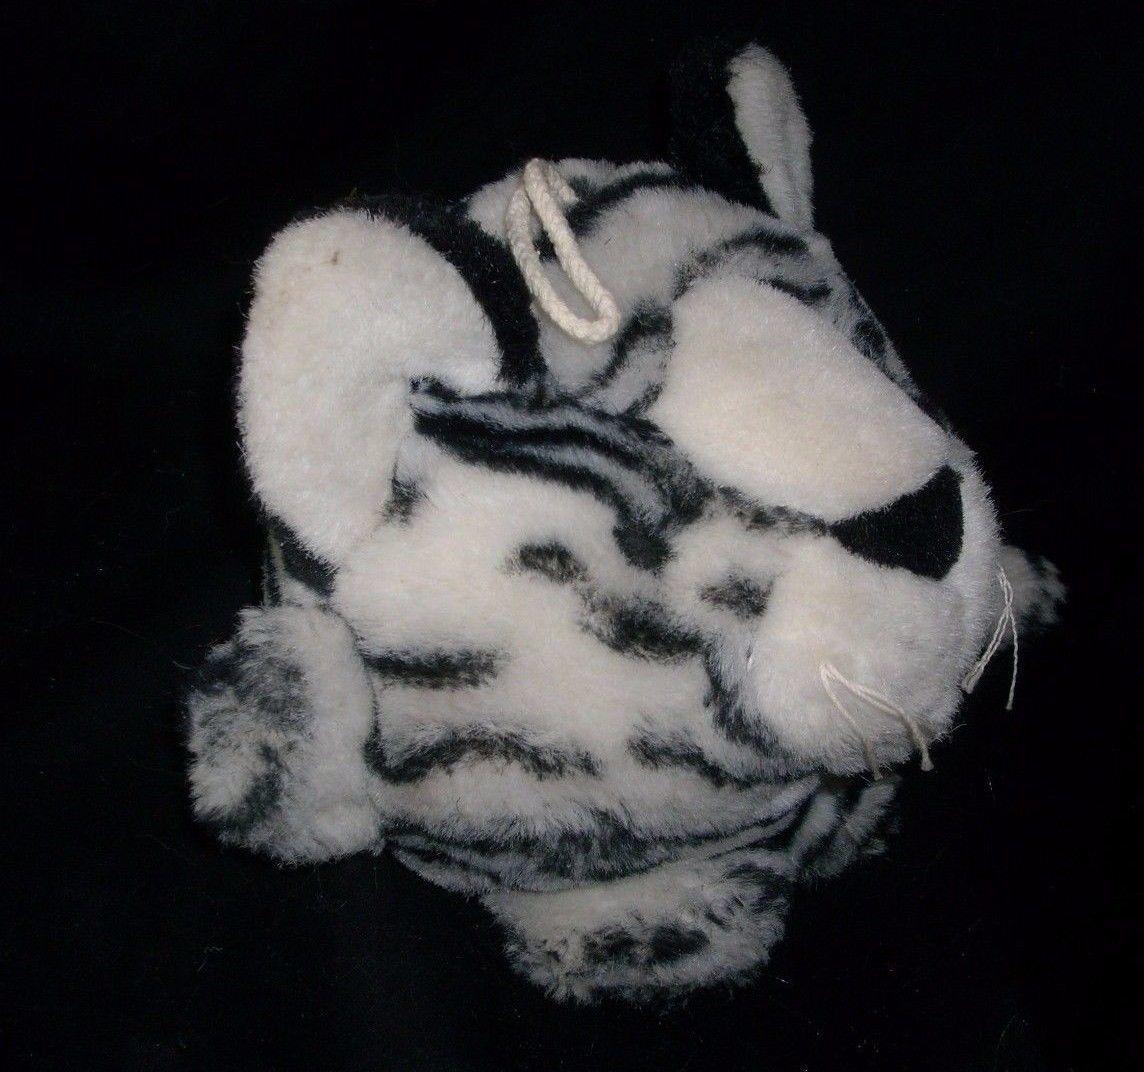 VINTAGE MAIN JOY LIMITED WHITE BLACK PURRING PURR TIGER STUFFED ANIMAL PLUSH TOY image 2